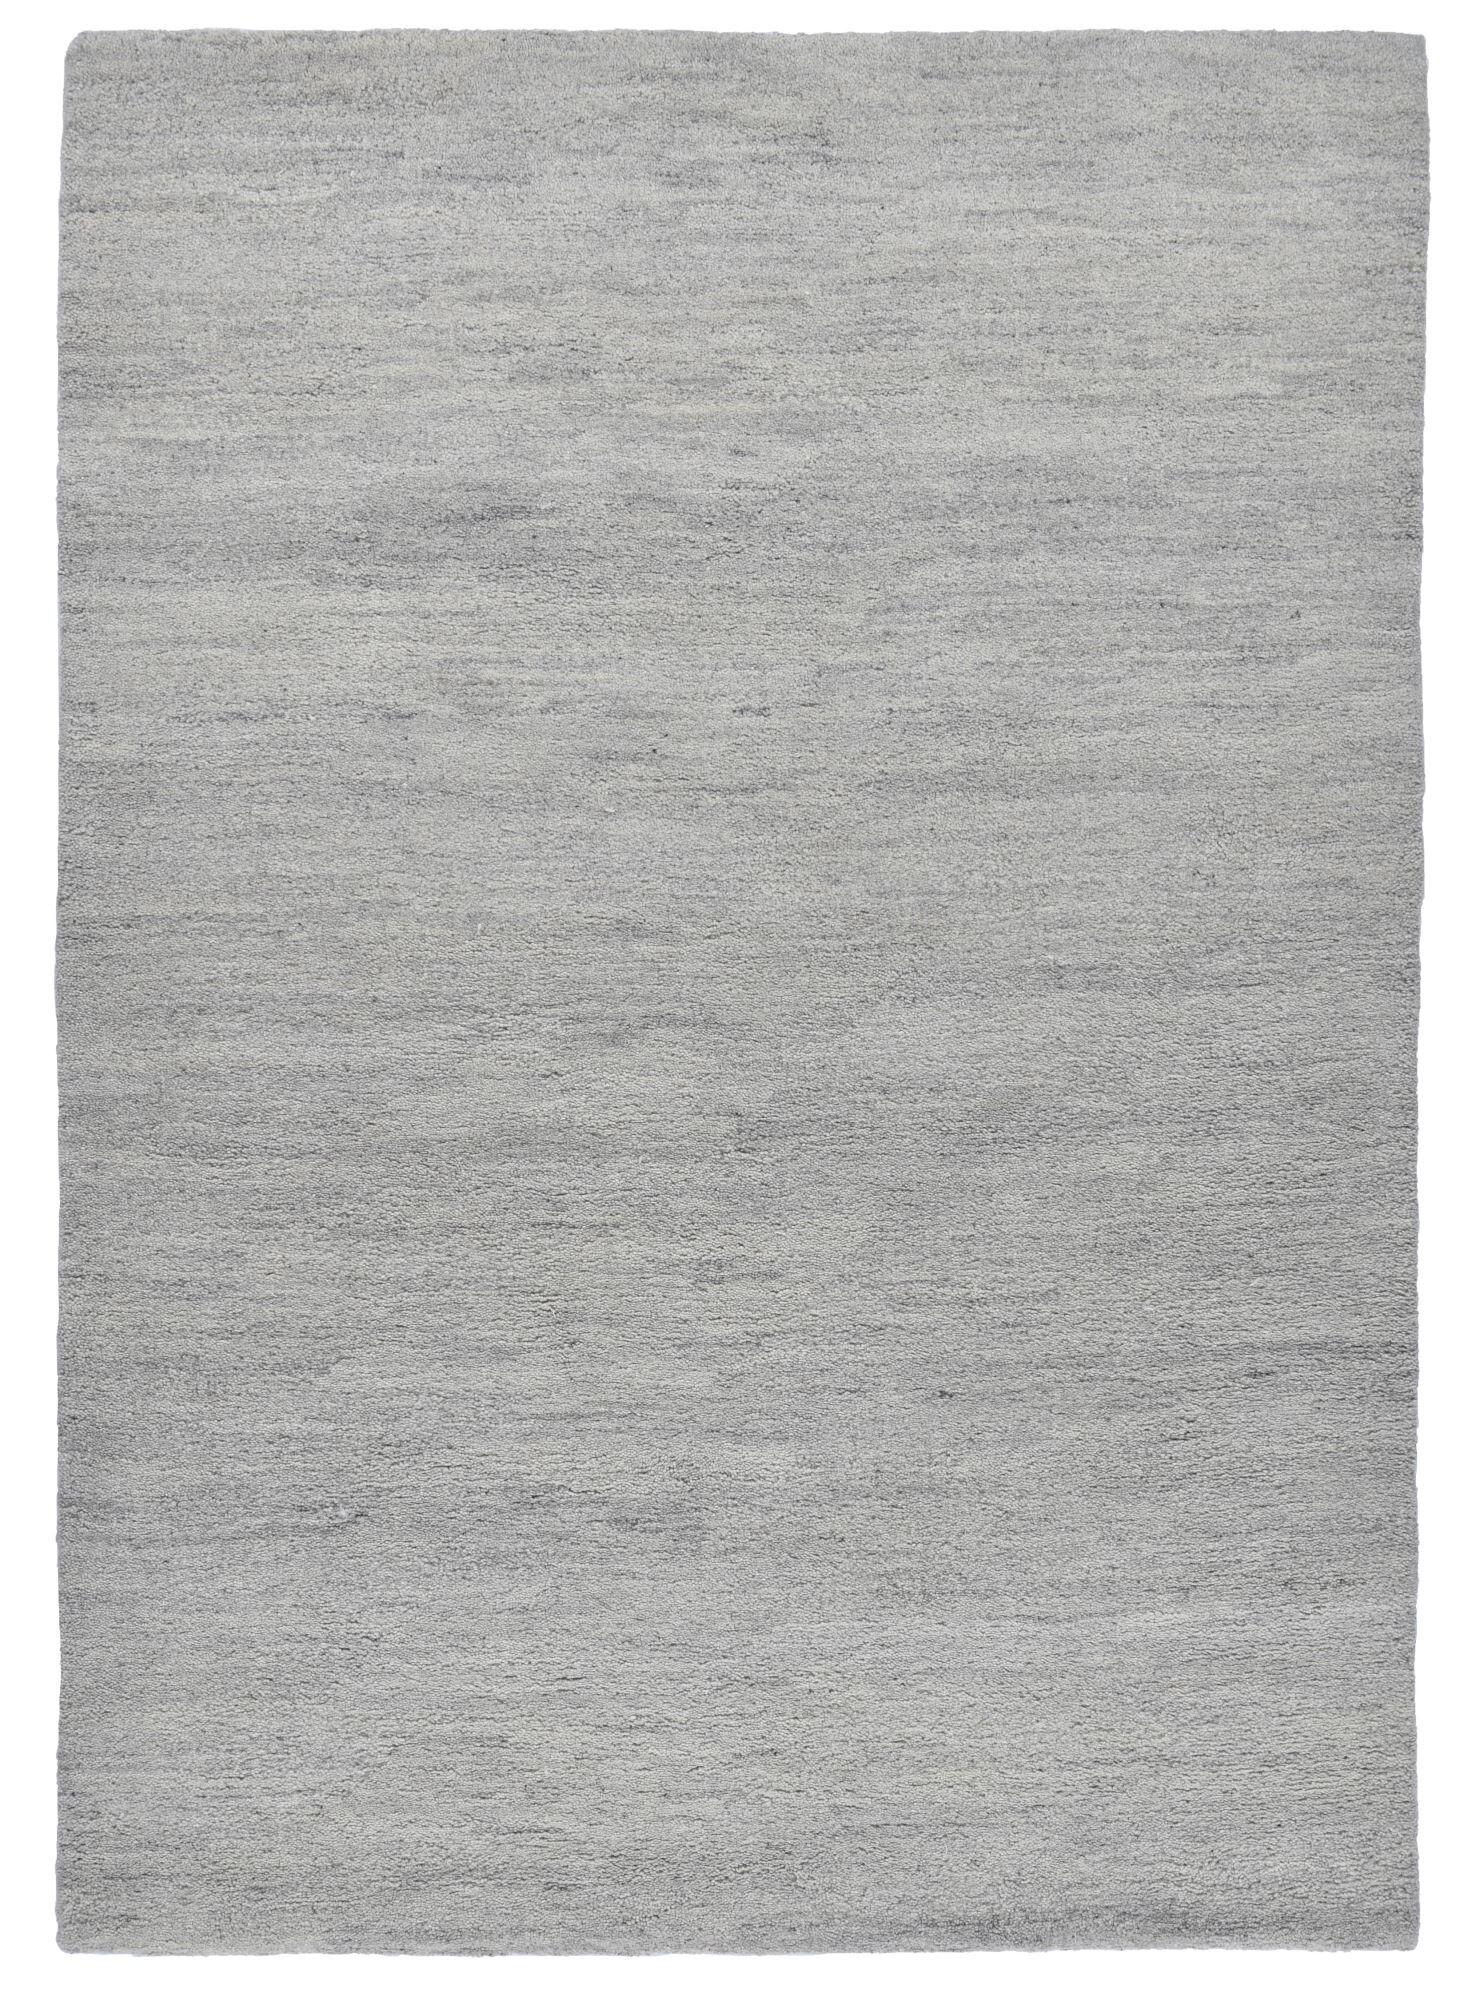 THEKO Tapis berber du maroc en laine naturelle gris 140x200